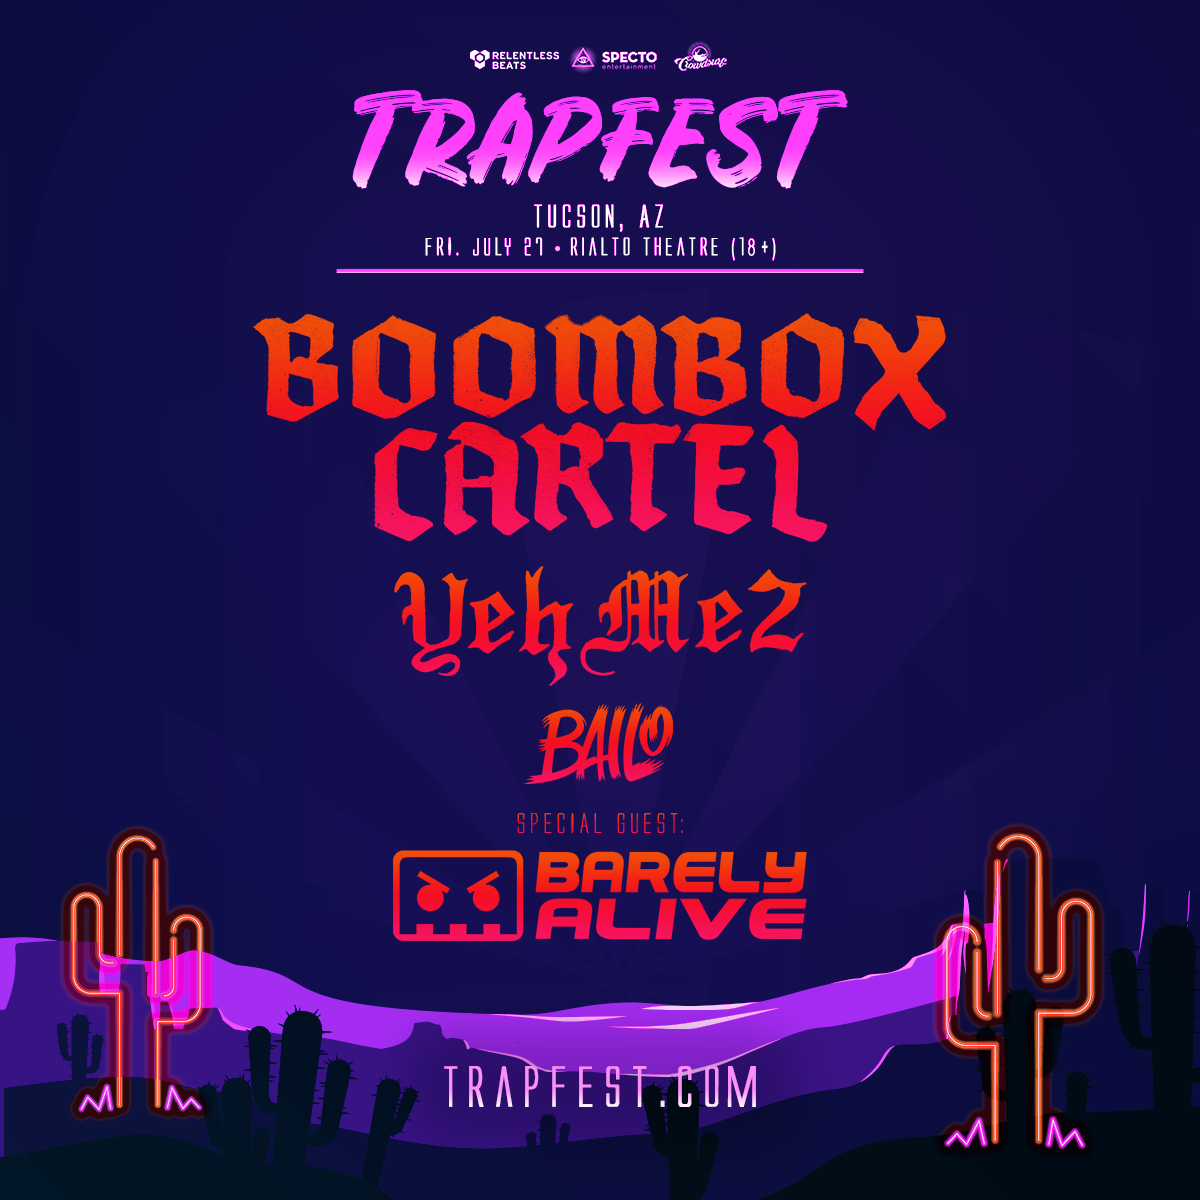 Flyer for Trapfest Tucson 2018